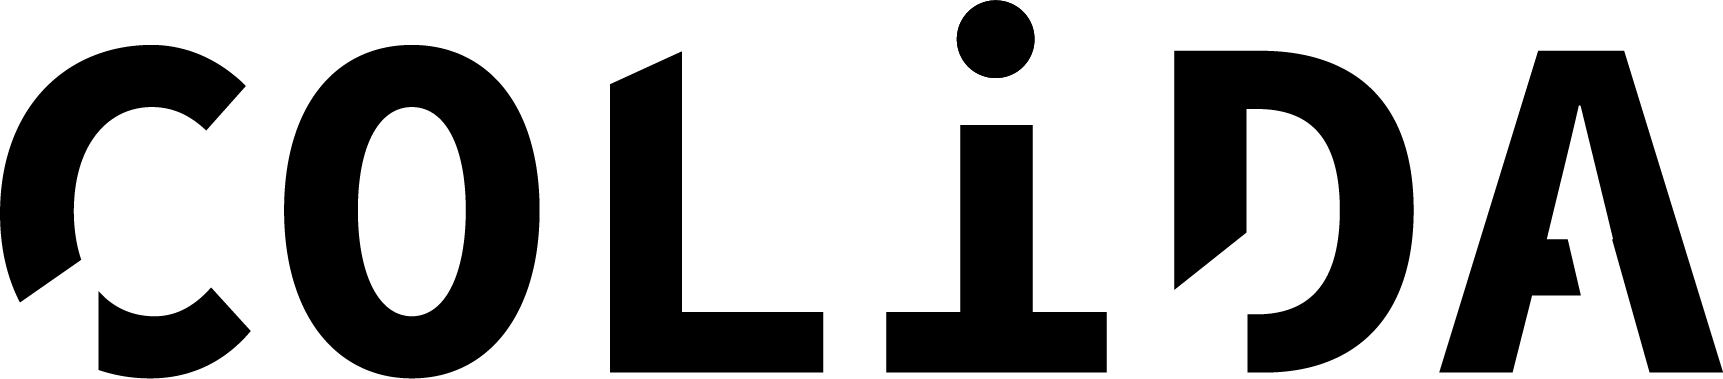 Colida logo black